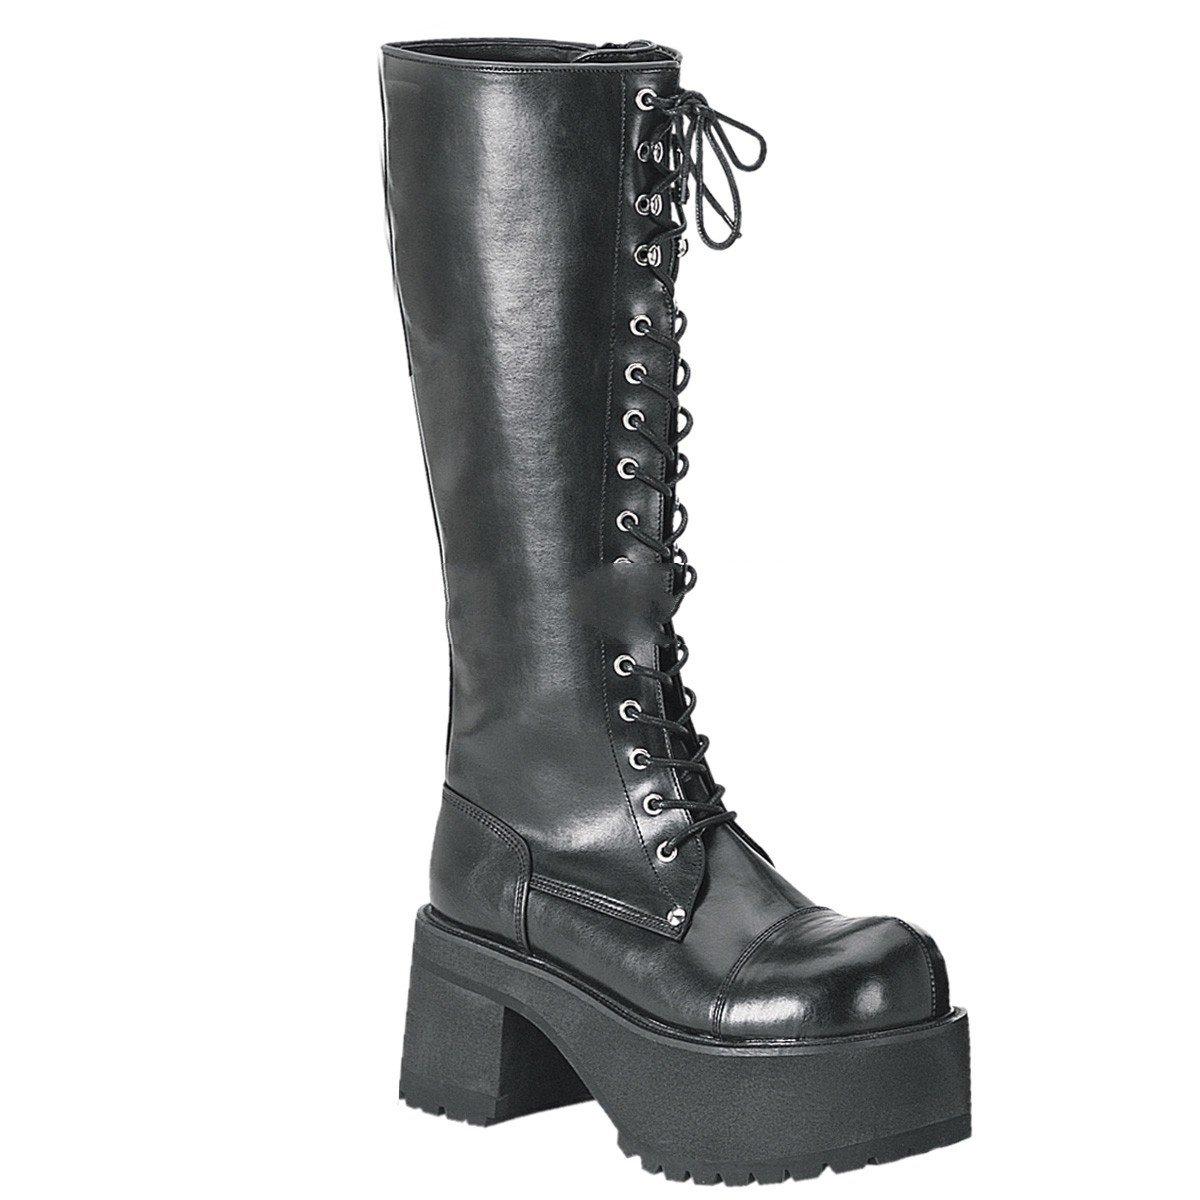 Demonia Demonia Demonia Ranger-302 - Gothic Industrial Unisex Plateau Stiefel Schuhe 36-43 9d75d1